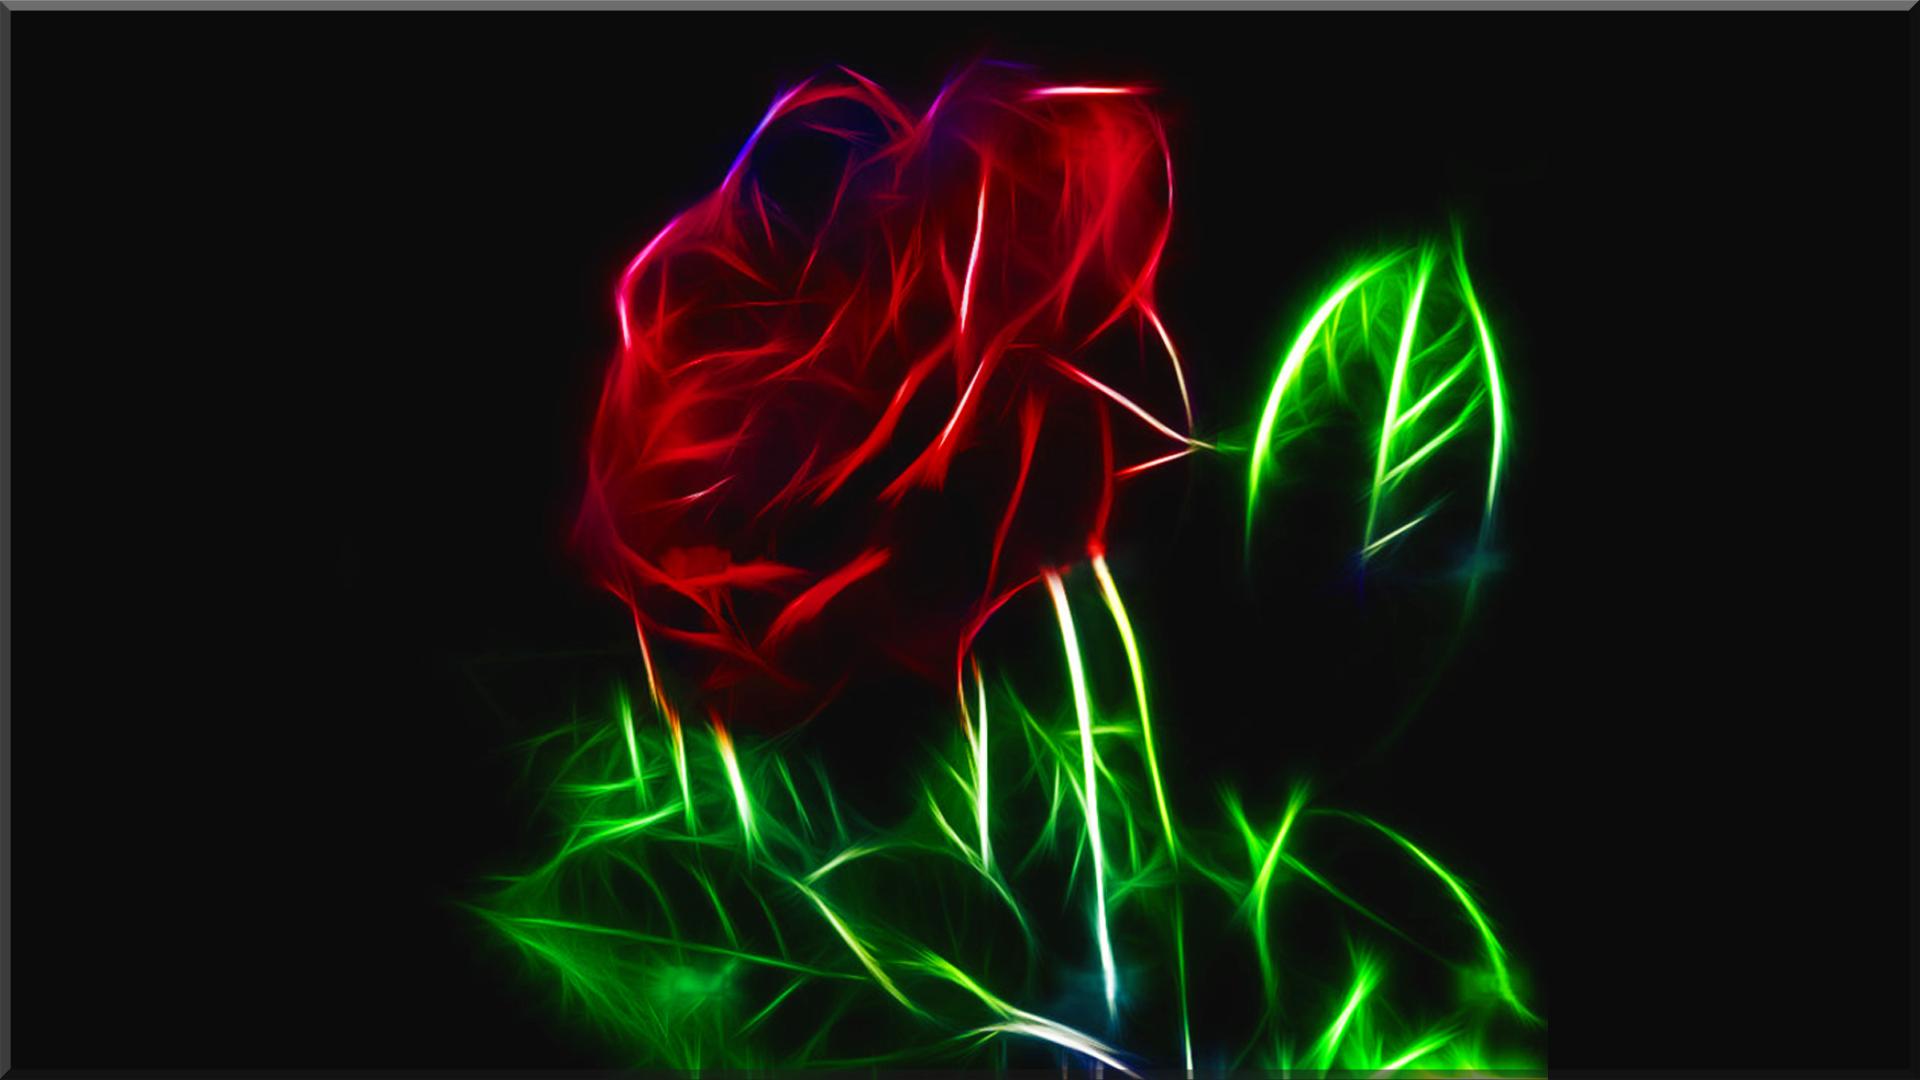 Fractal rose hd wallpaper background image 1920x1080 - Rose desktop wallpaper hd ...